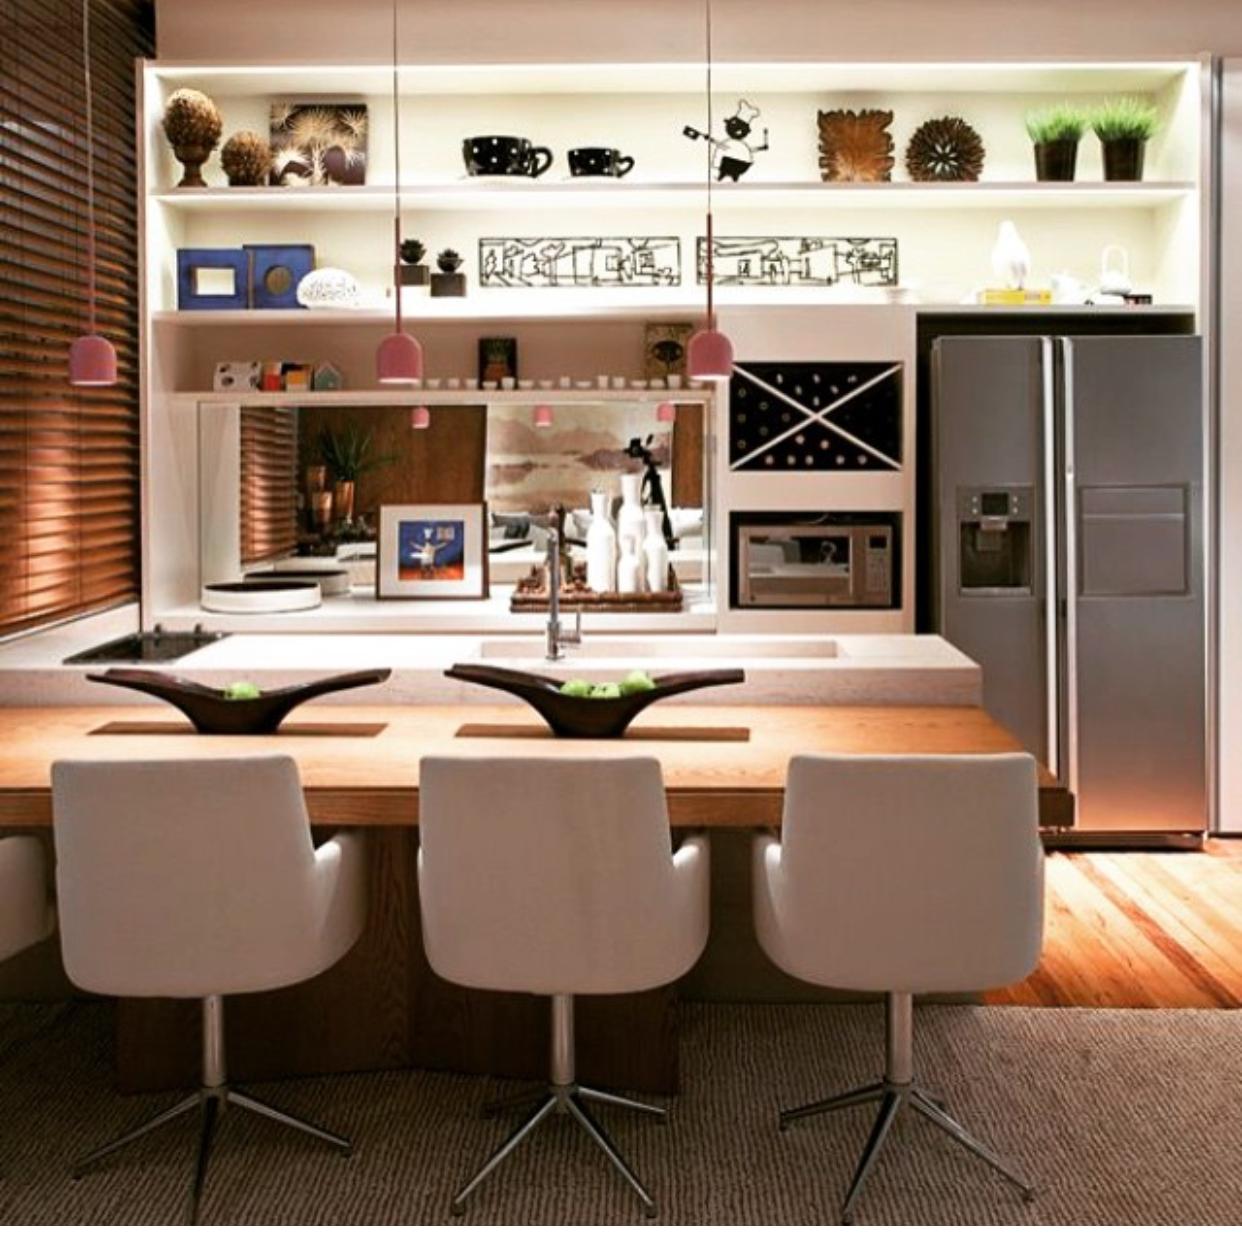 Sala De Jantar Integrada Cozinha Gourmet Estante Geladeira Side  -> Cozinha Integrada Com Sala De Jantar Pequena